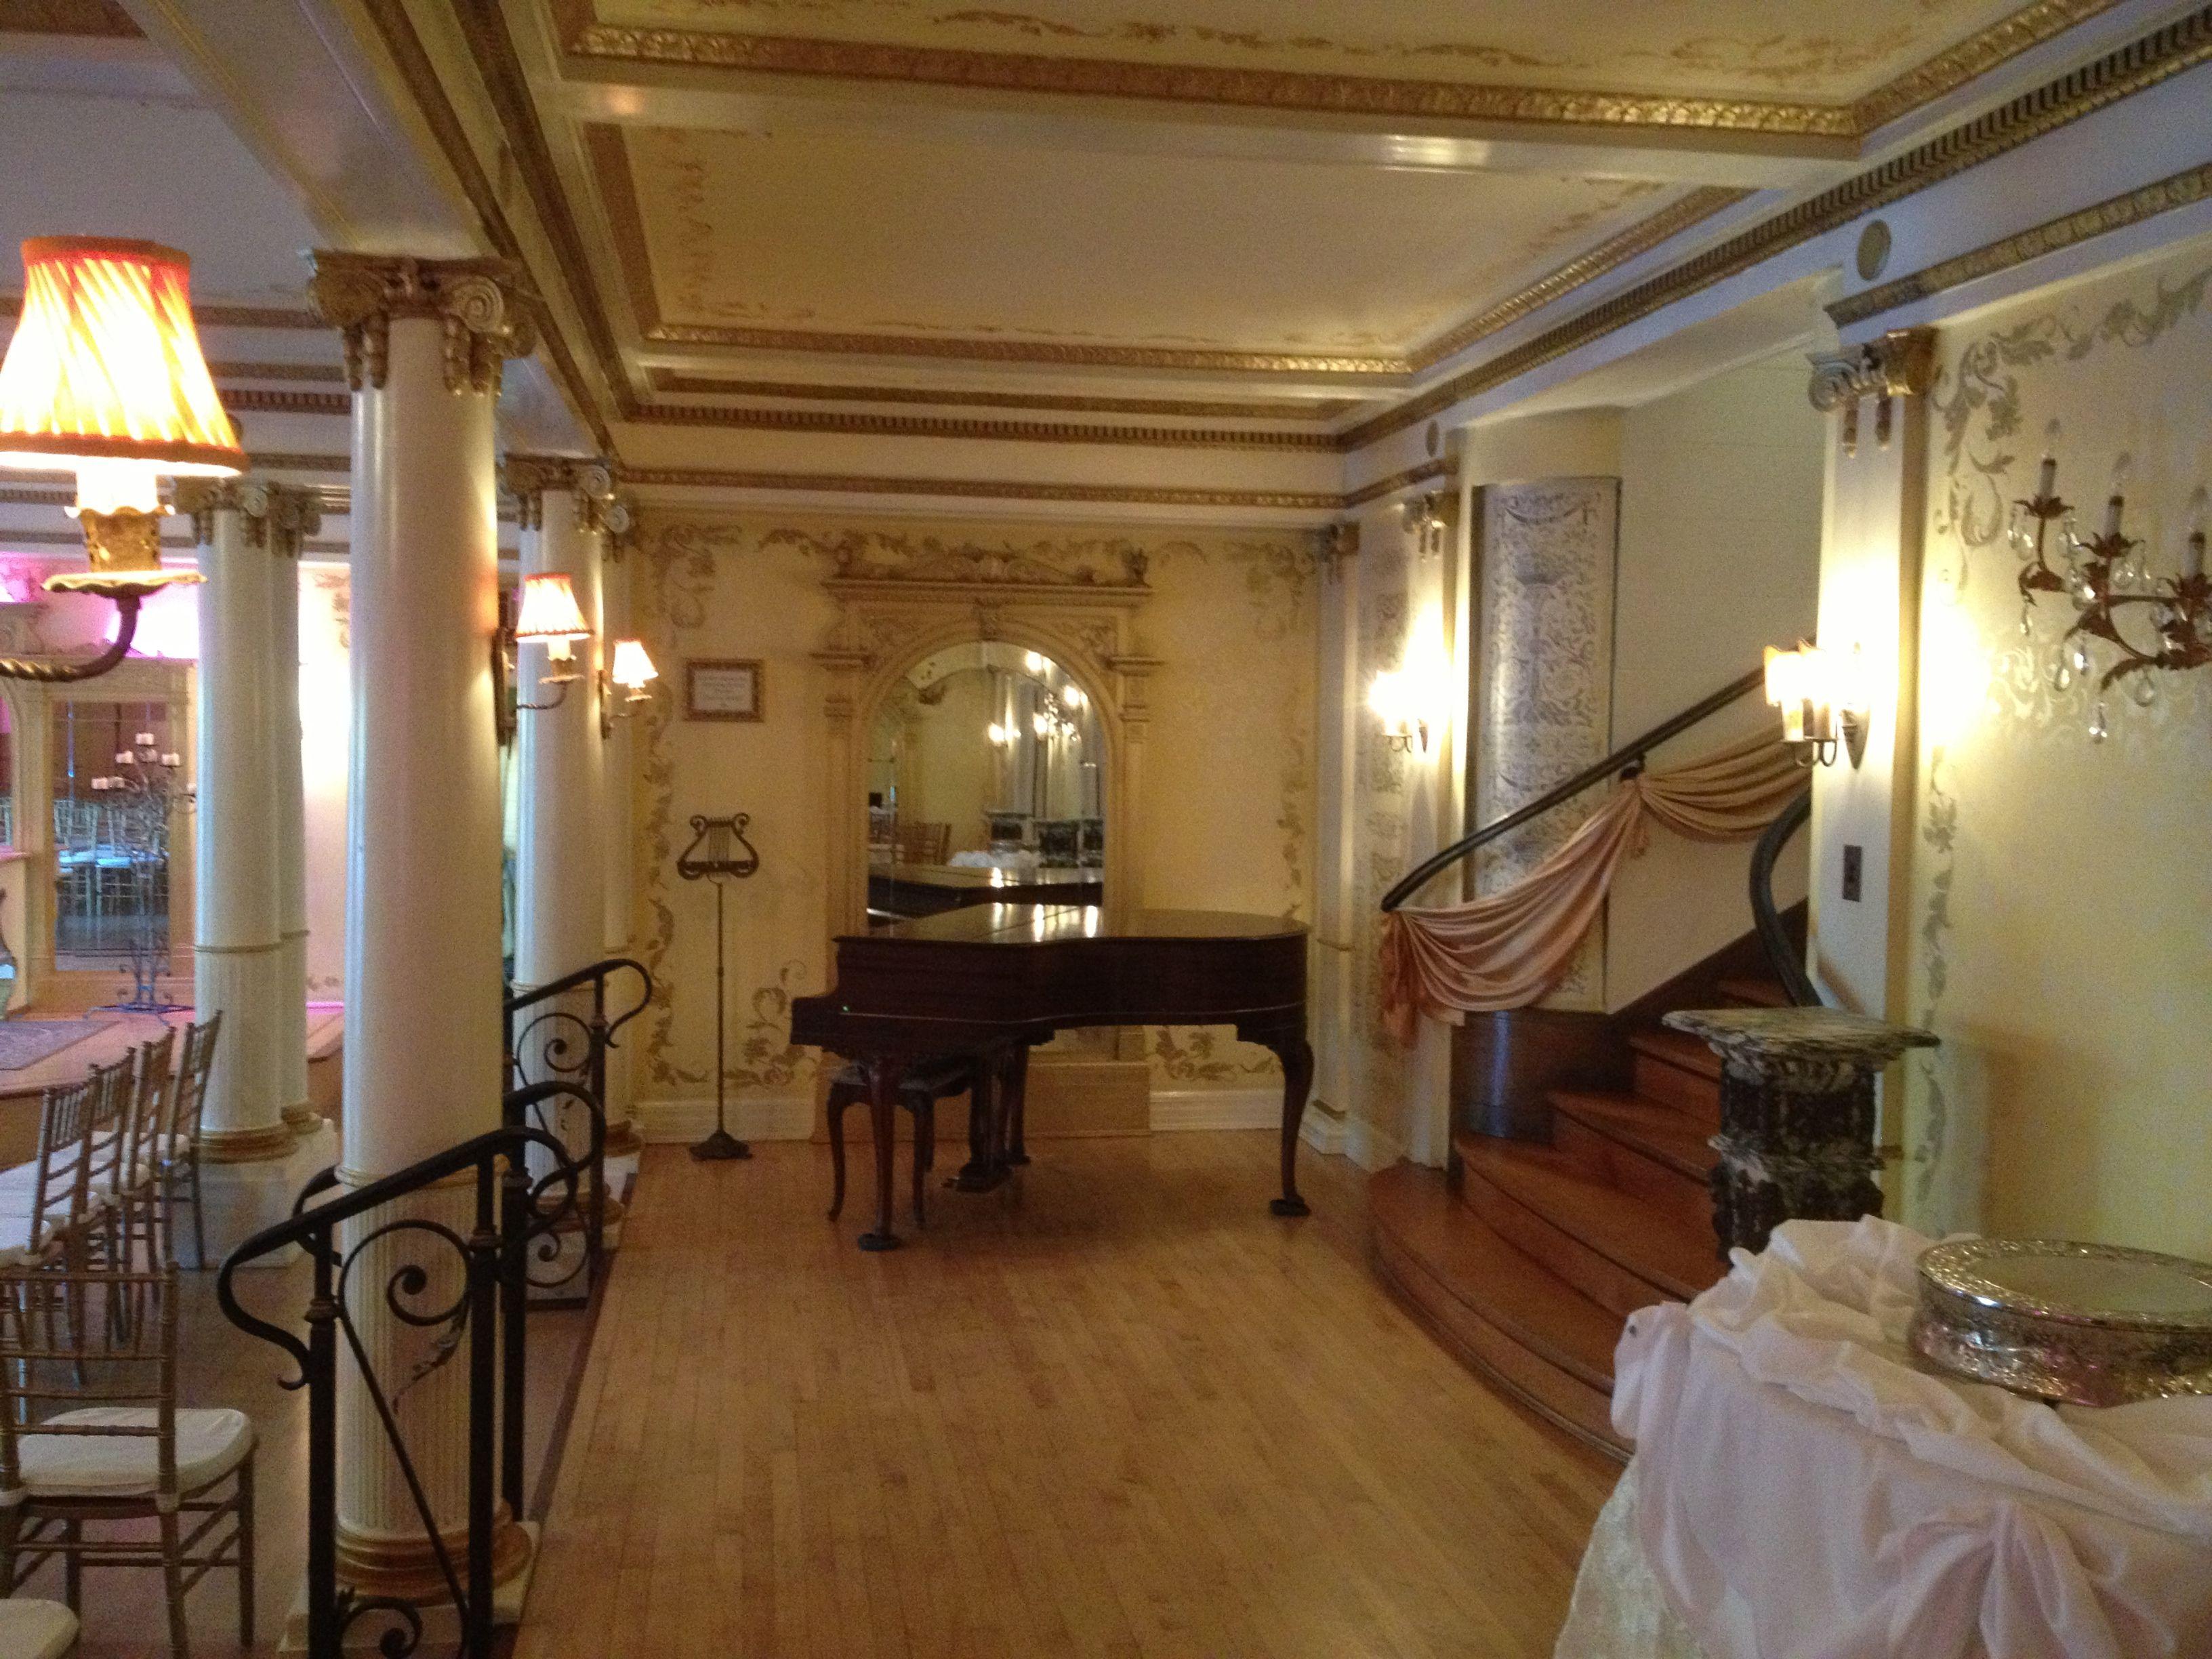 Inside The Grand Island Mansion Piano Grand Island Mansion Grand Island Mansions